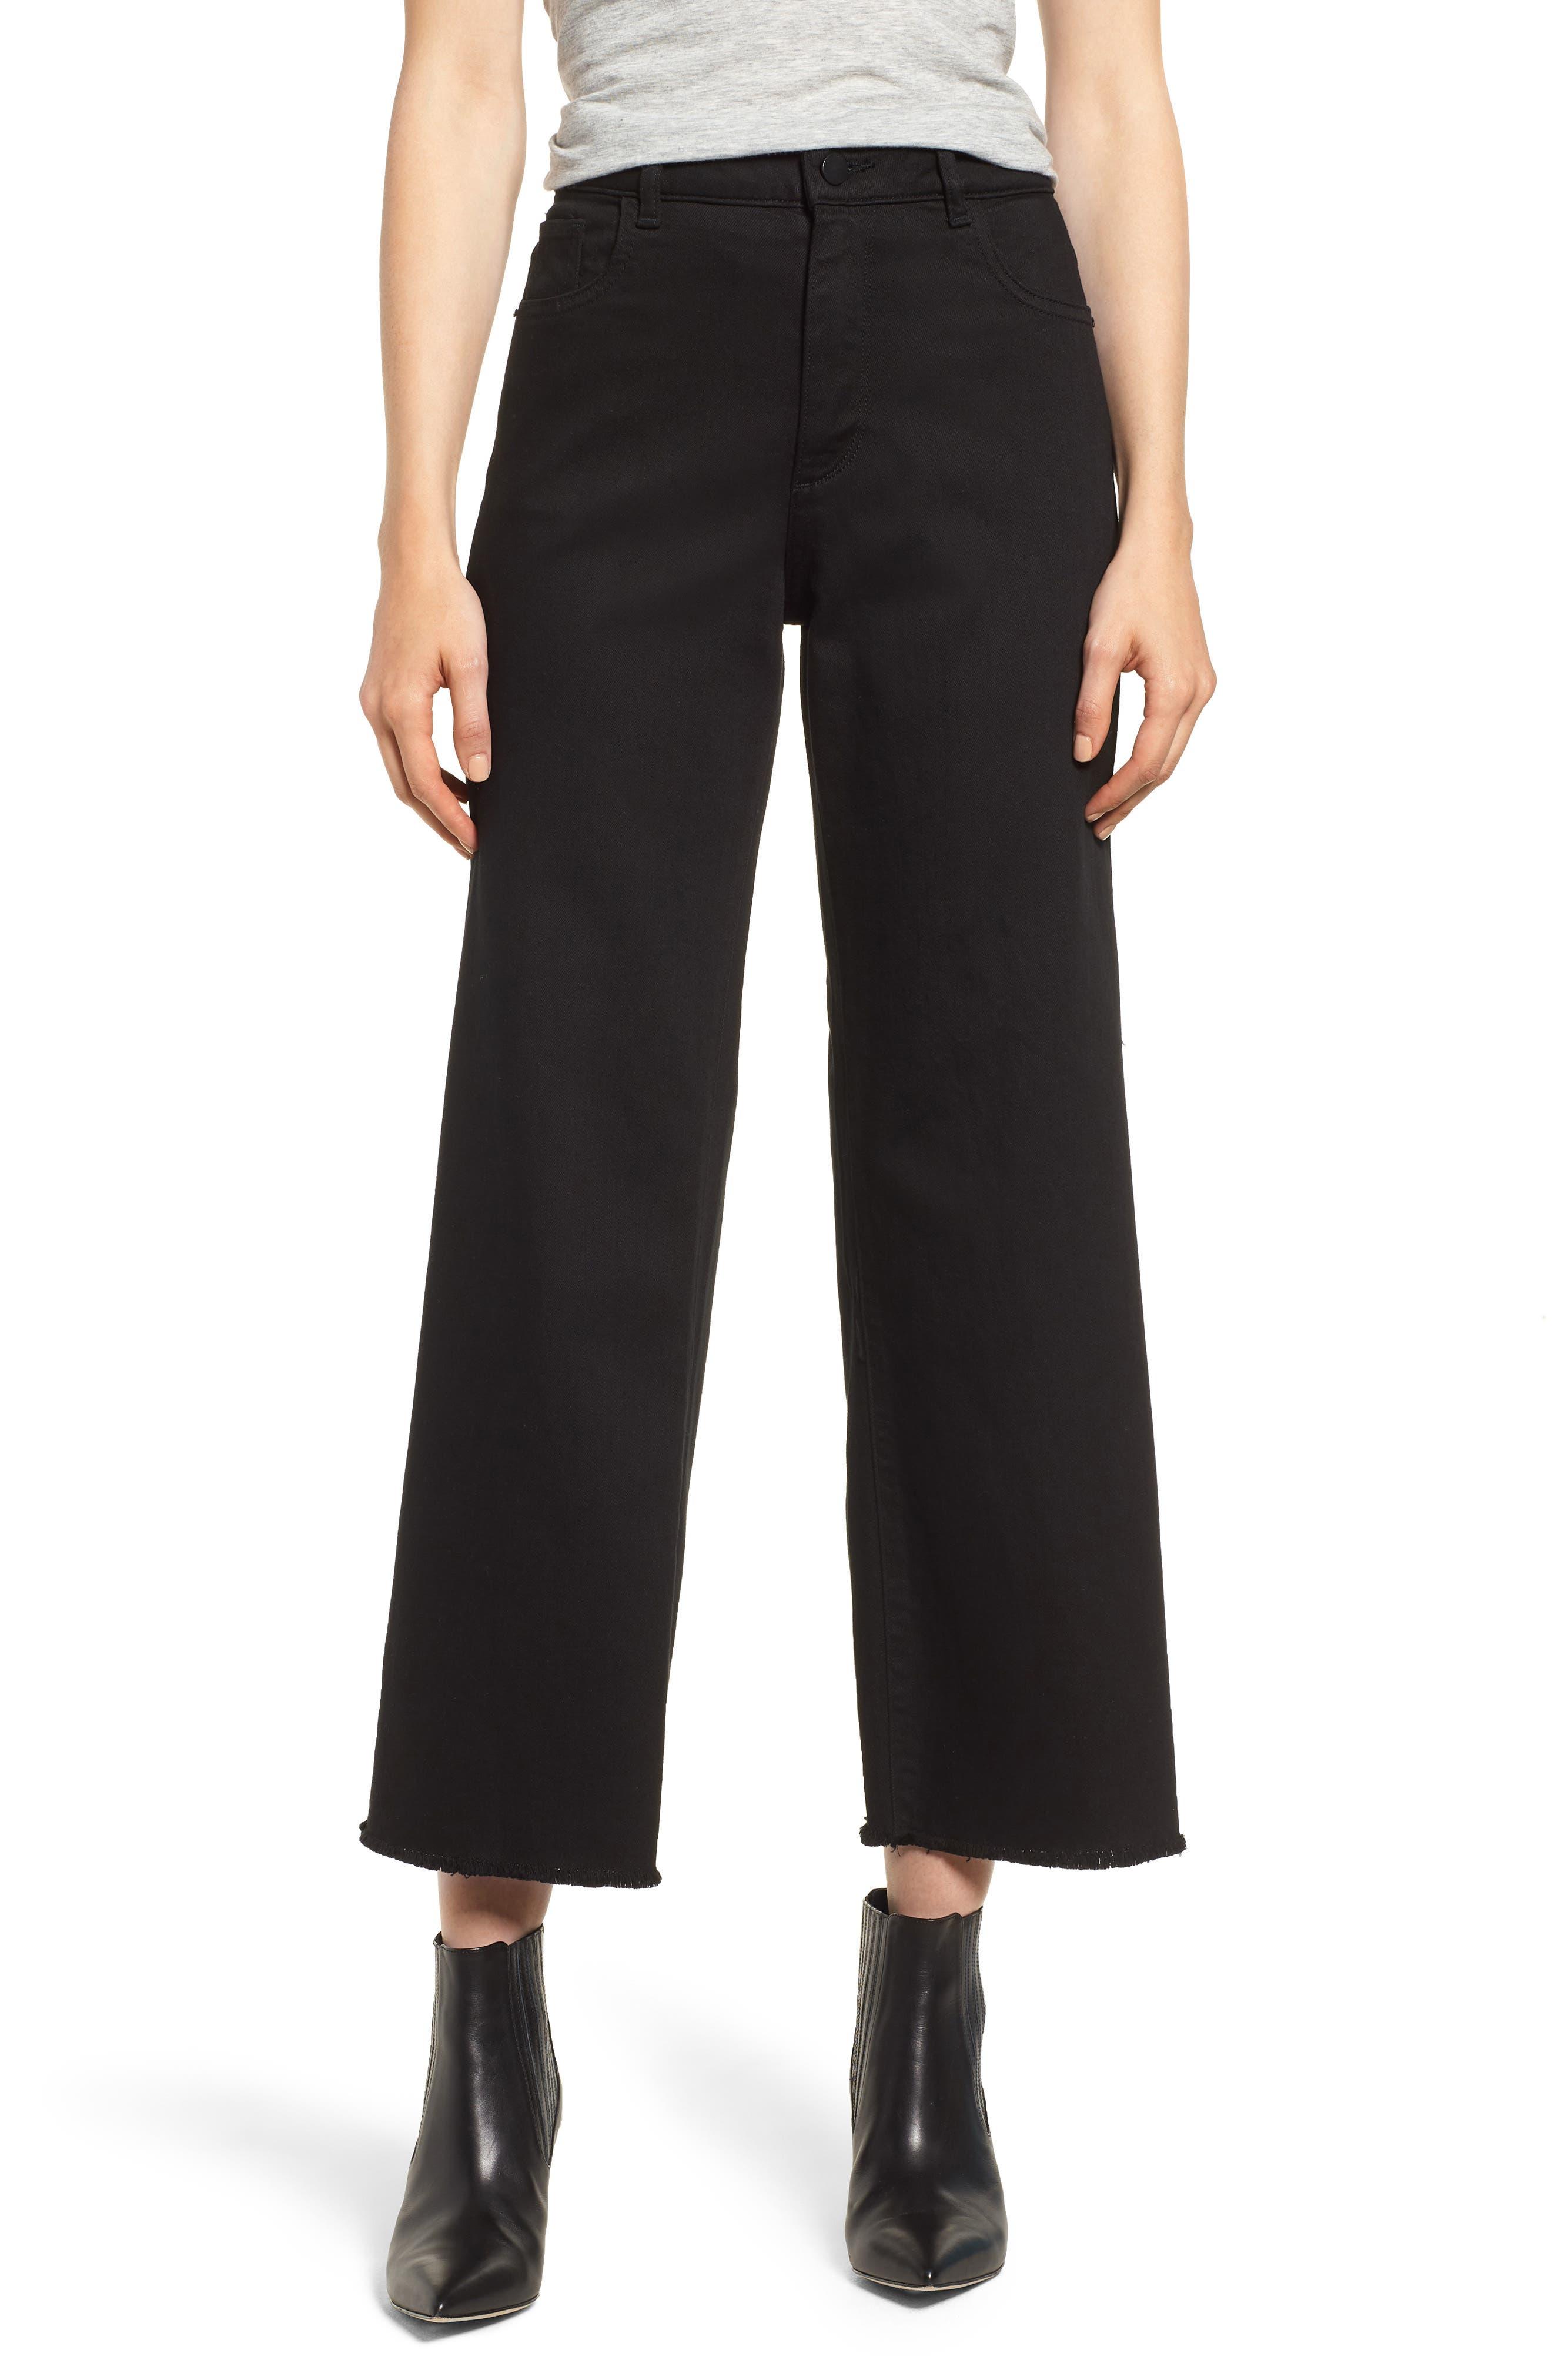 Hepburn High Waist Raw Hem Wide Leg Jeans,                             Main thumbnail 1, color,                             001